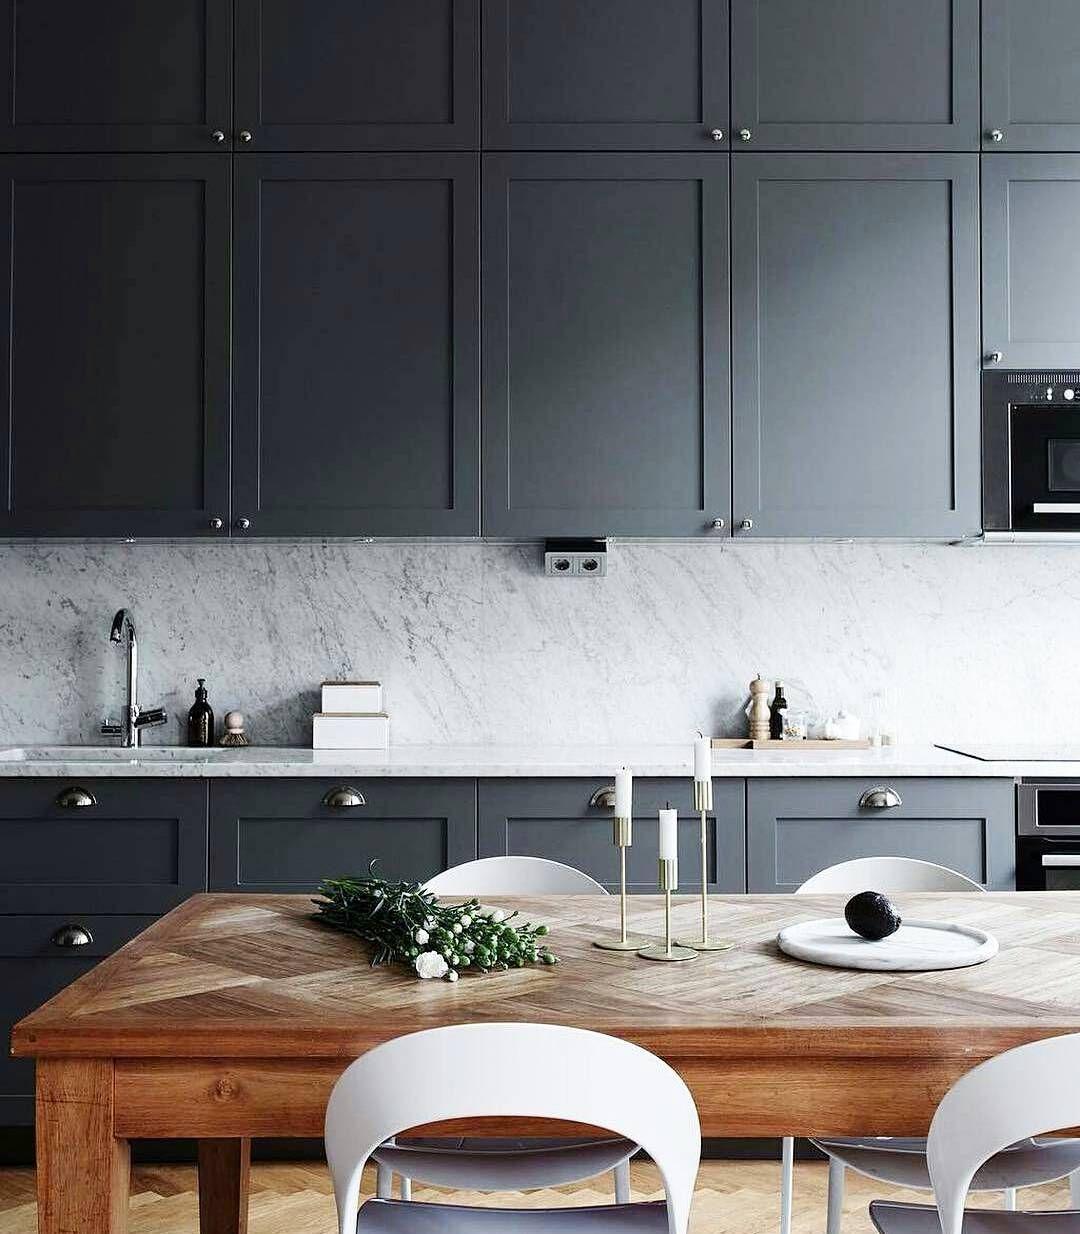 Modern Minimalist Kitchen Cabinets: Pin By DiscoverDMCI On Home Design Ideas